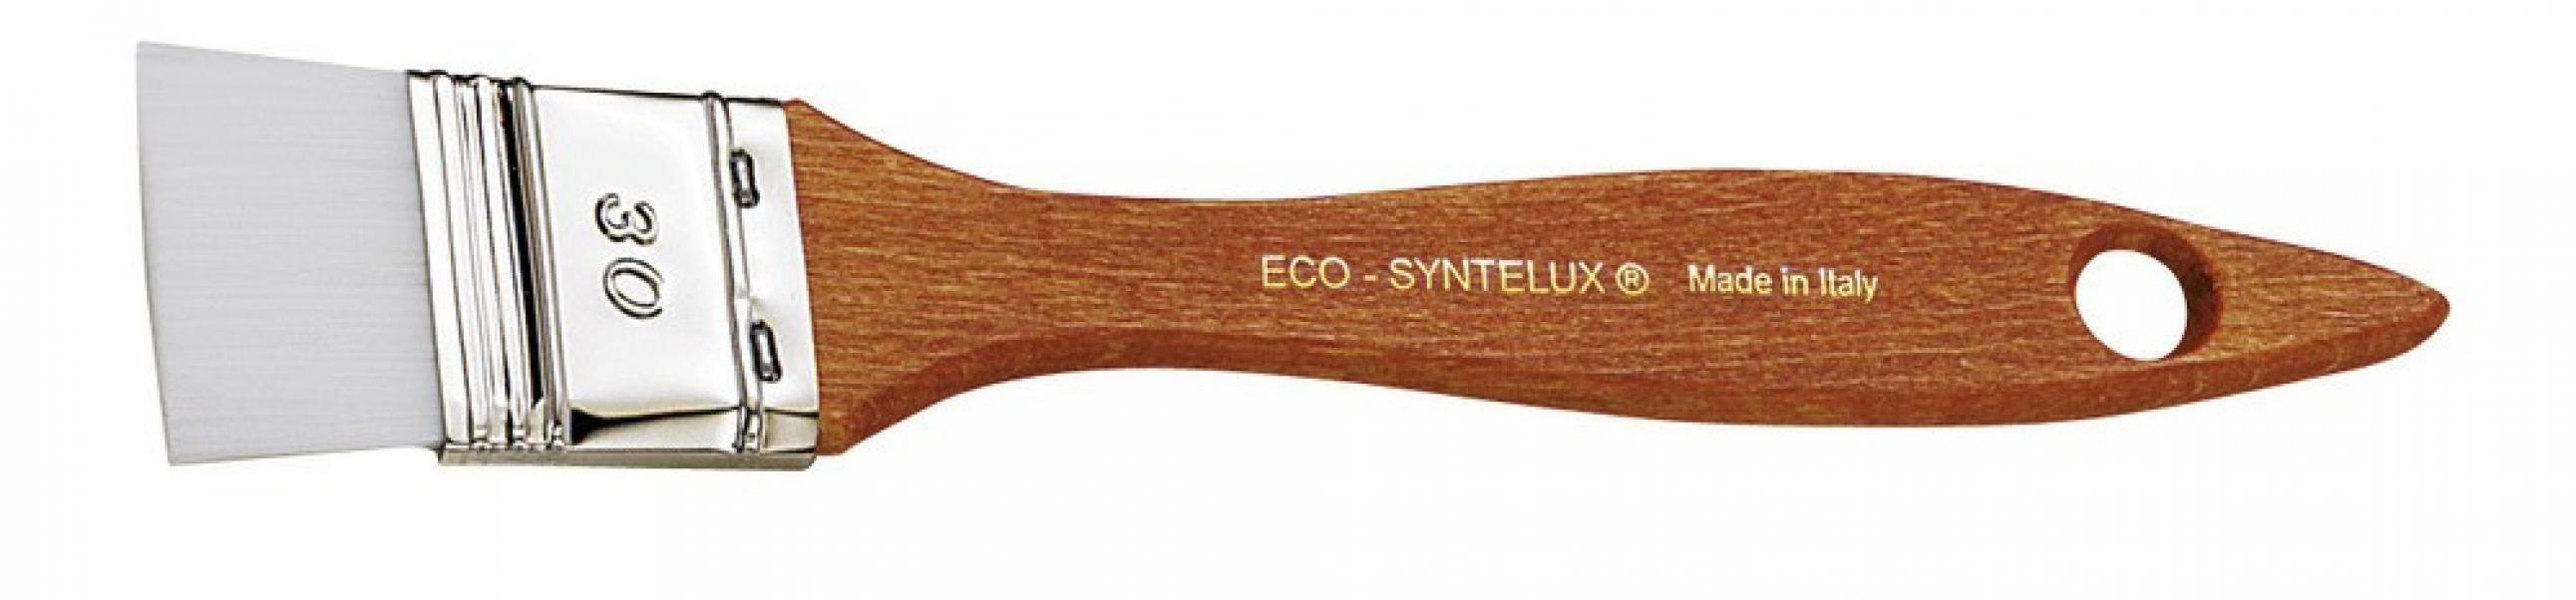 bulova bulova pennellessa 60 ecosyntelux bianco per decoupage